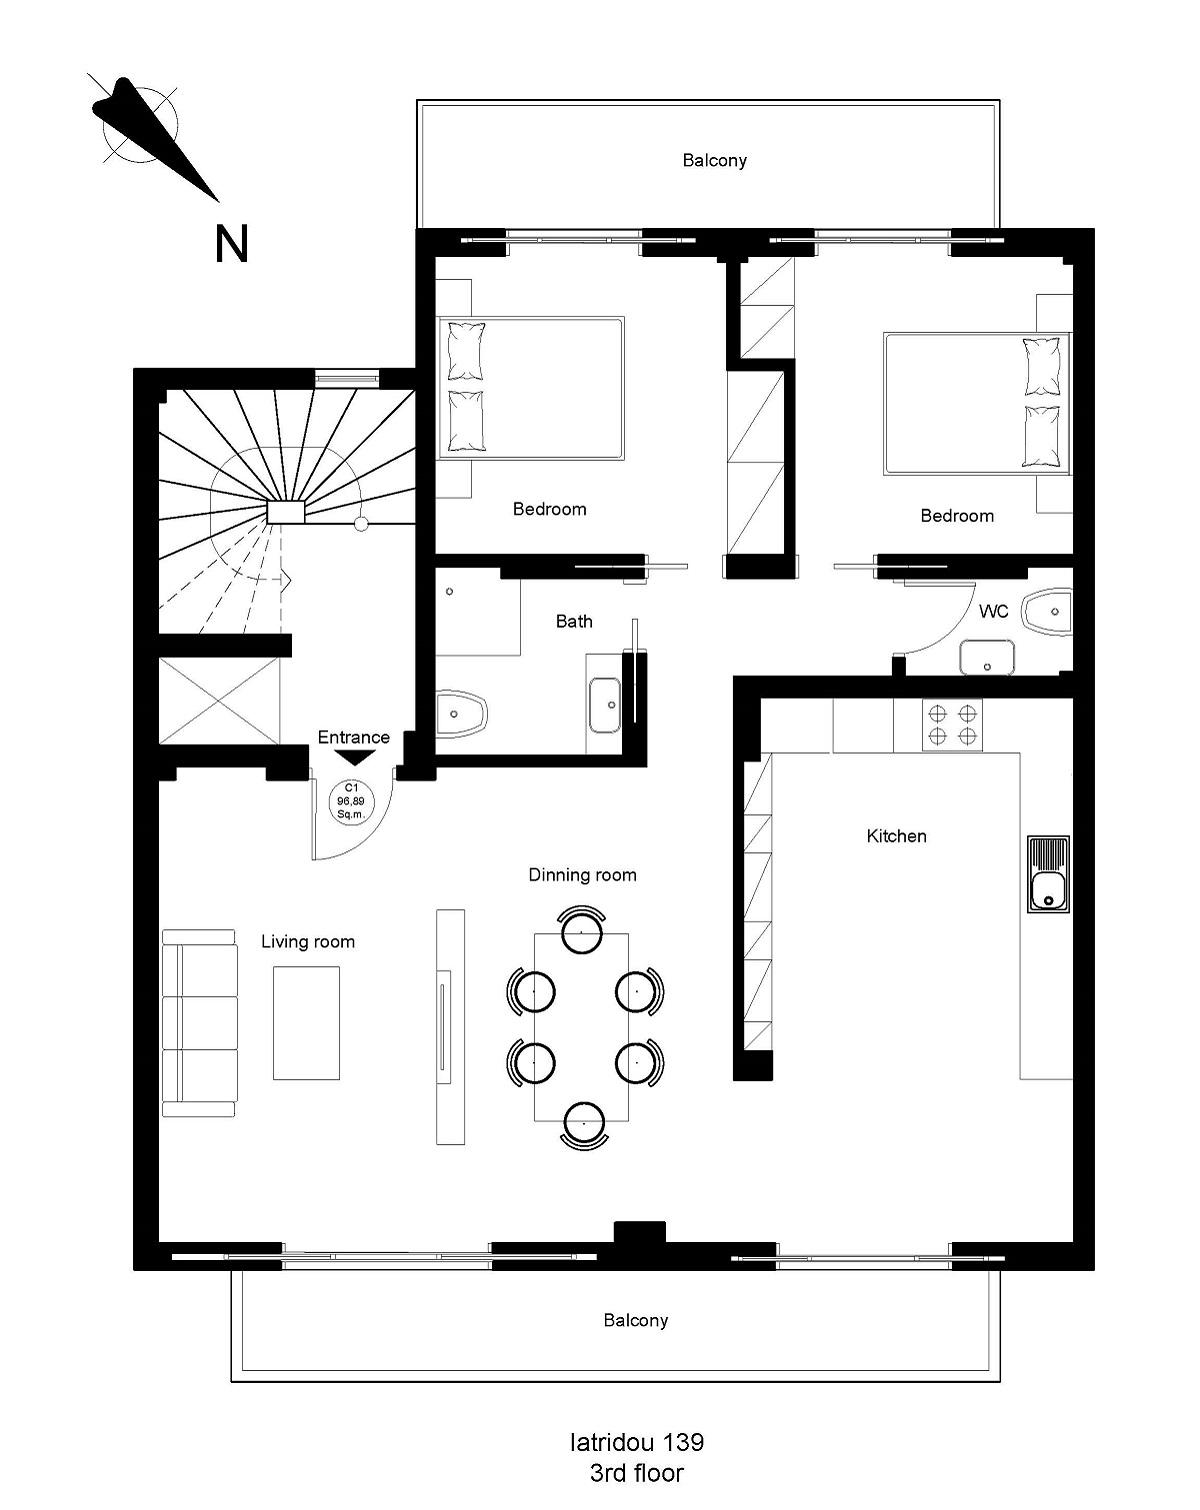 Iatridou 139 3rd floor plan